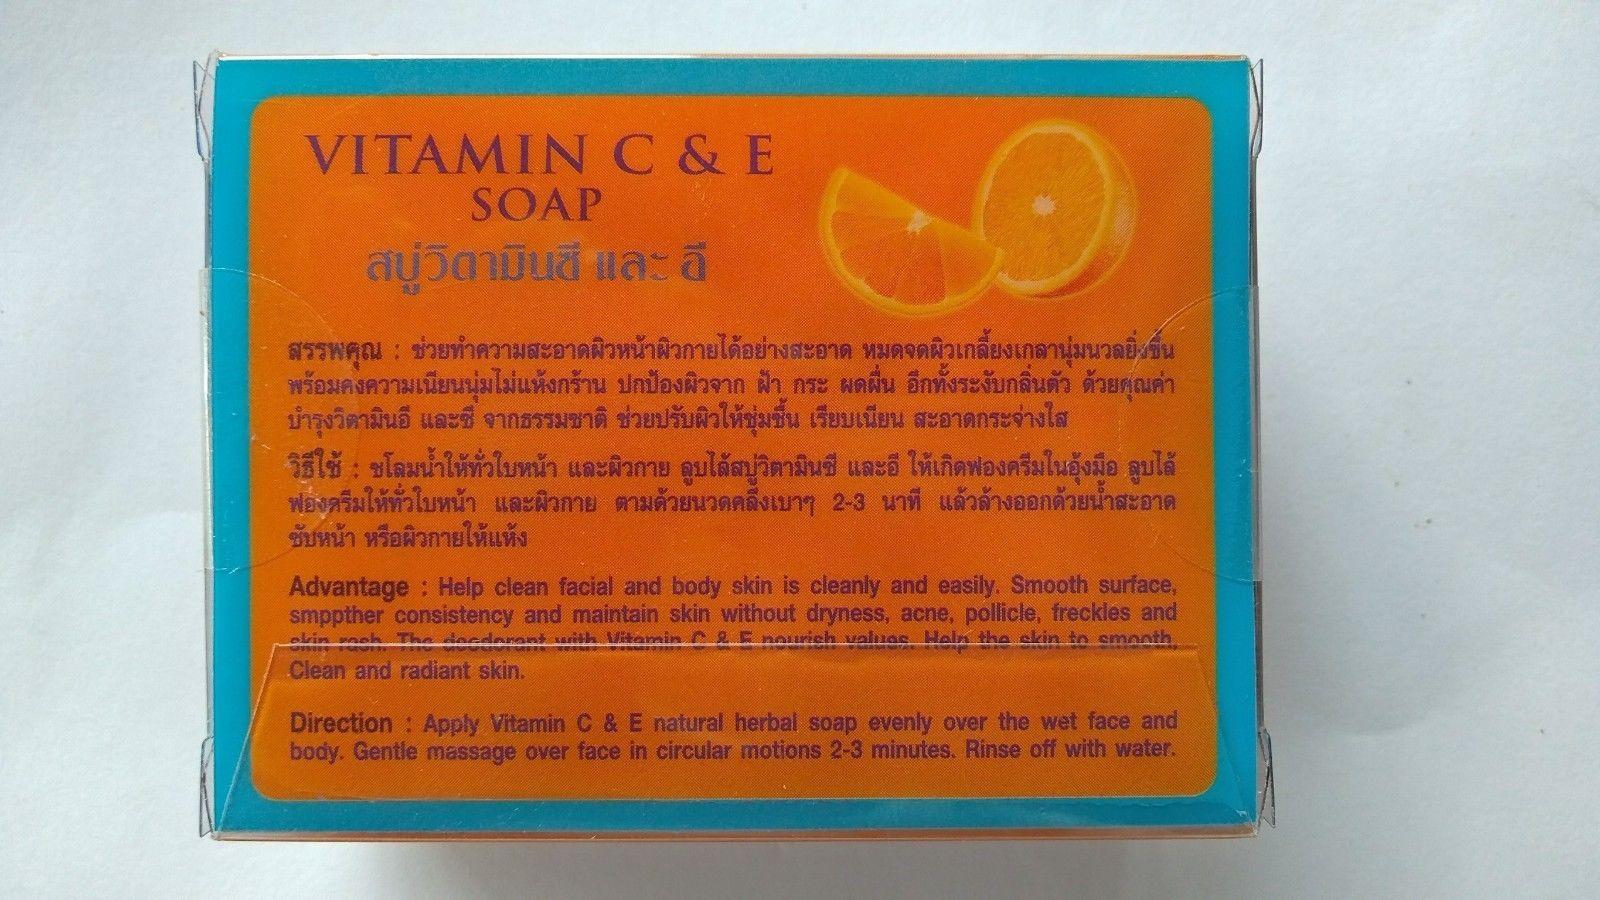 3 x 130g. Vipada Vitamin C & E Face Body Soap Radiant Skin Smooth Acne Freckles